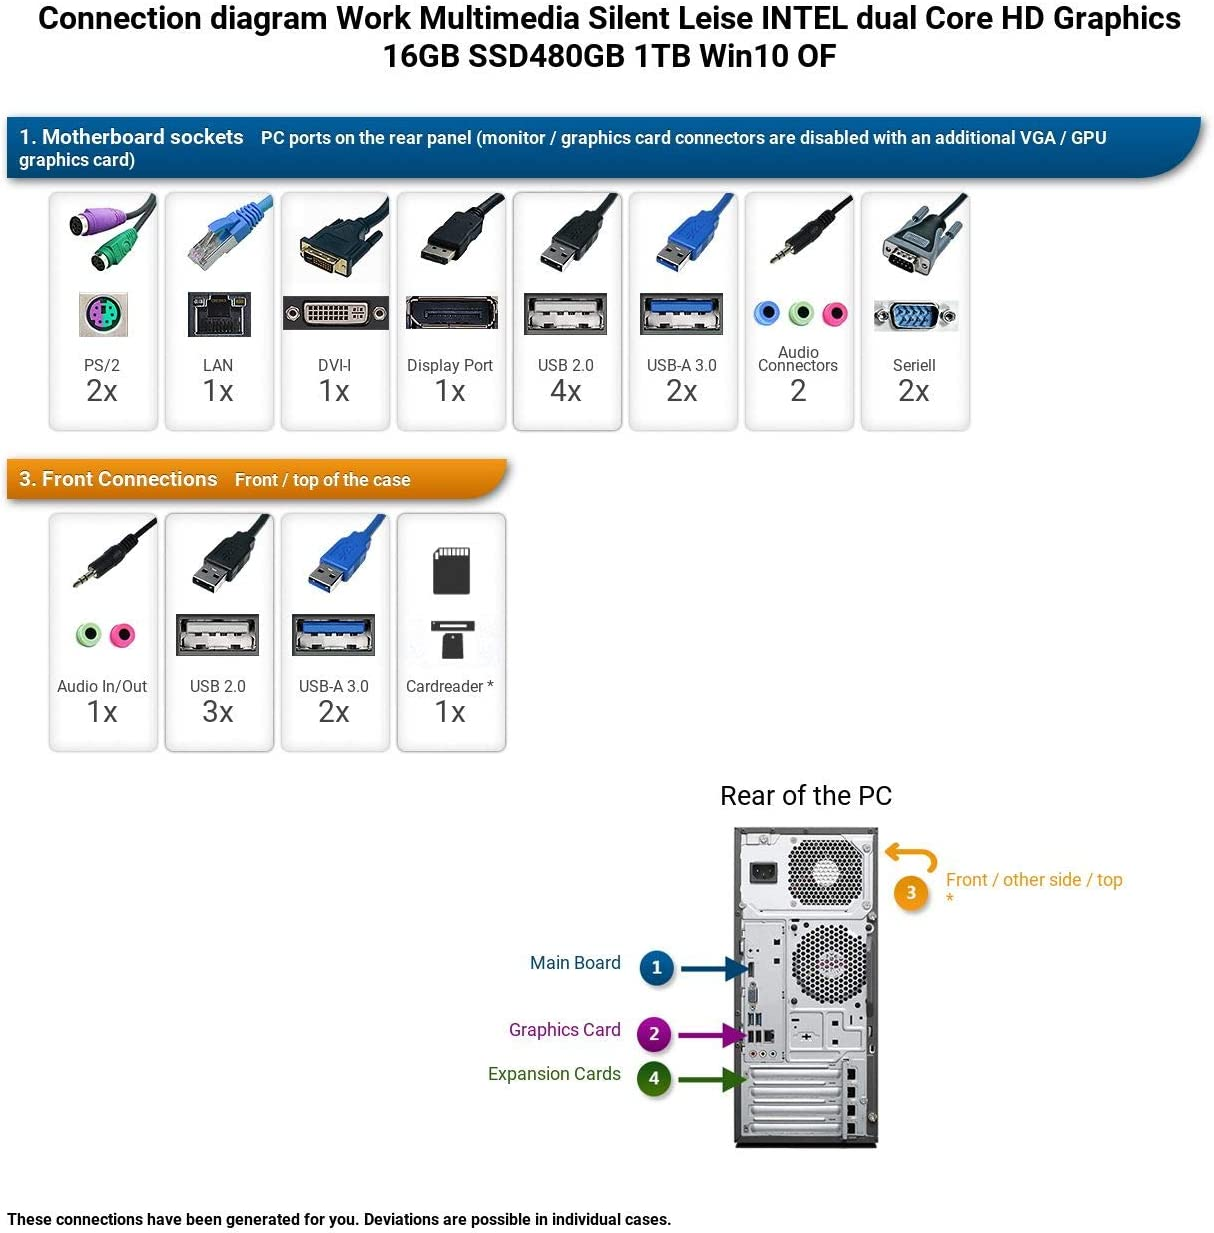 Ankermann Business favorevole silent PC PC Intel Core i3-4130 2x 3.40GHz HD Graphic 16GB RAM 480GB SSD 500GB HDD Windows 10 PRO W-LAN Office Professional